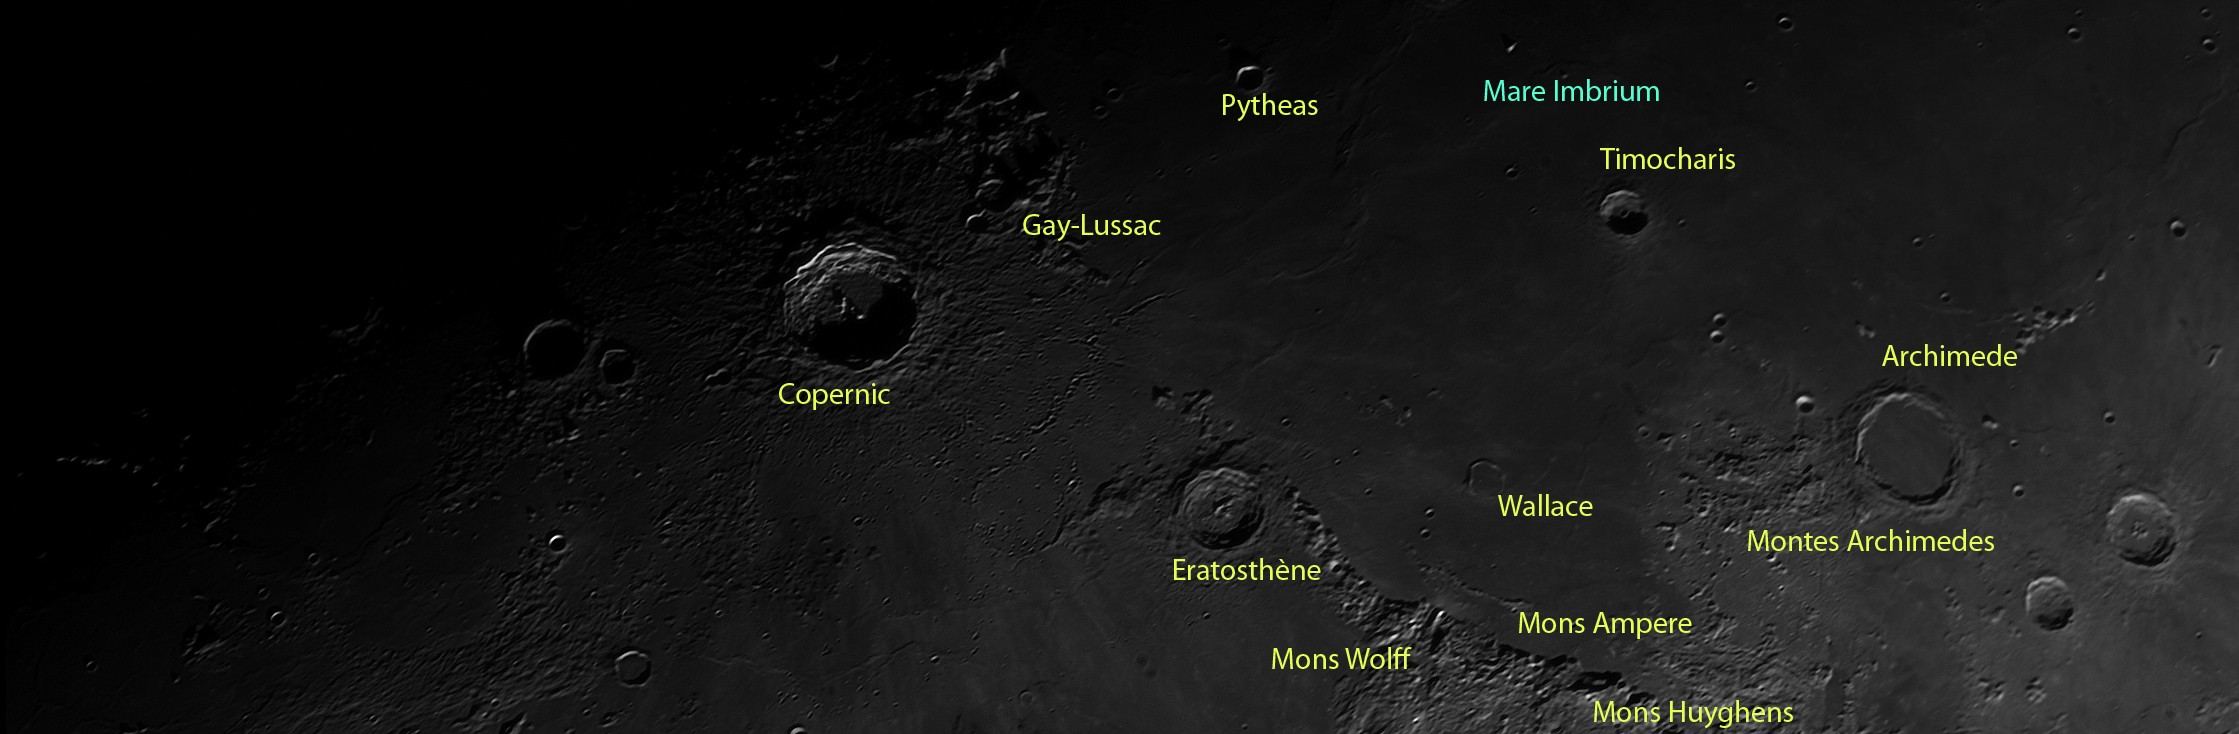 La Lune - Page 3 Panoma11